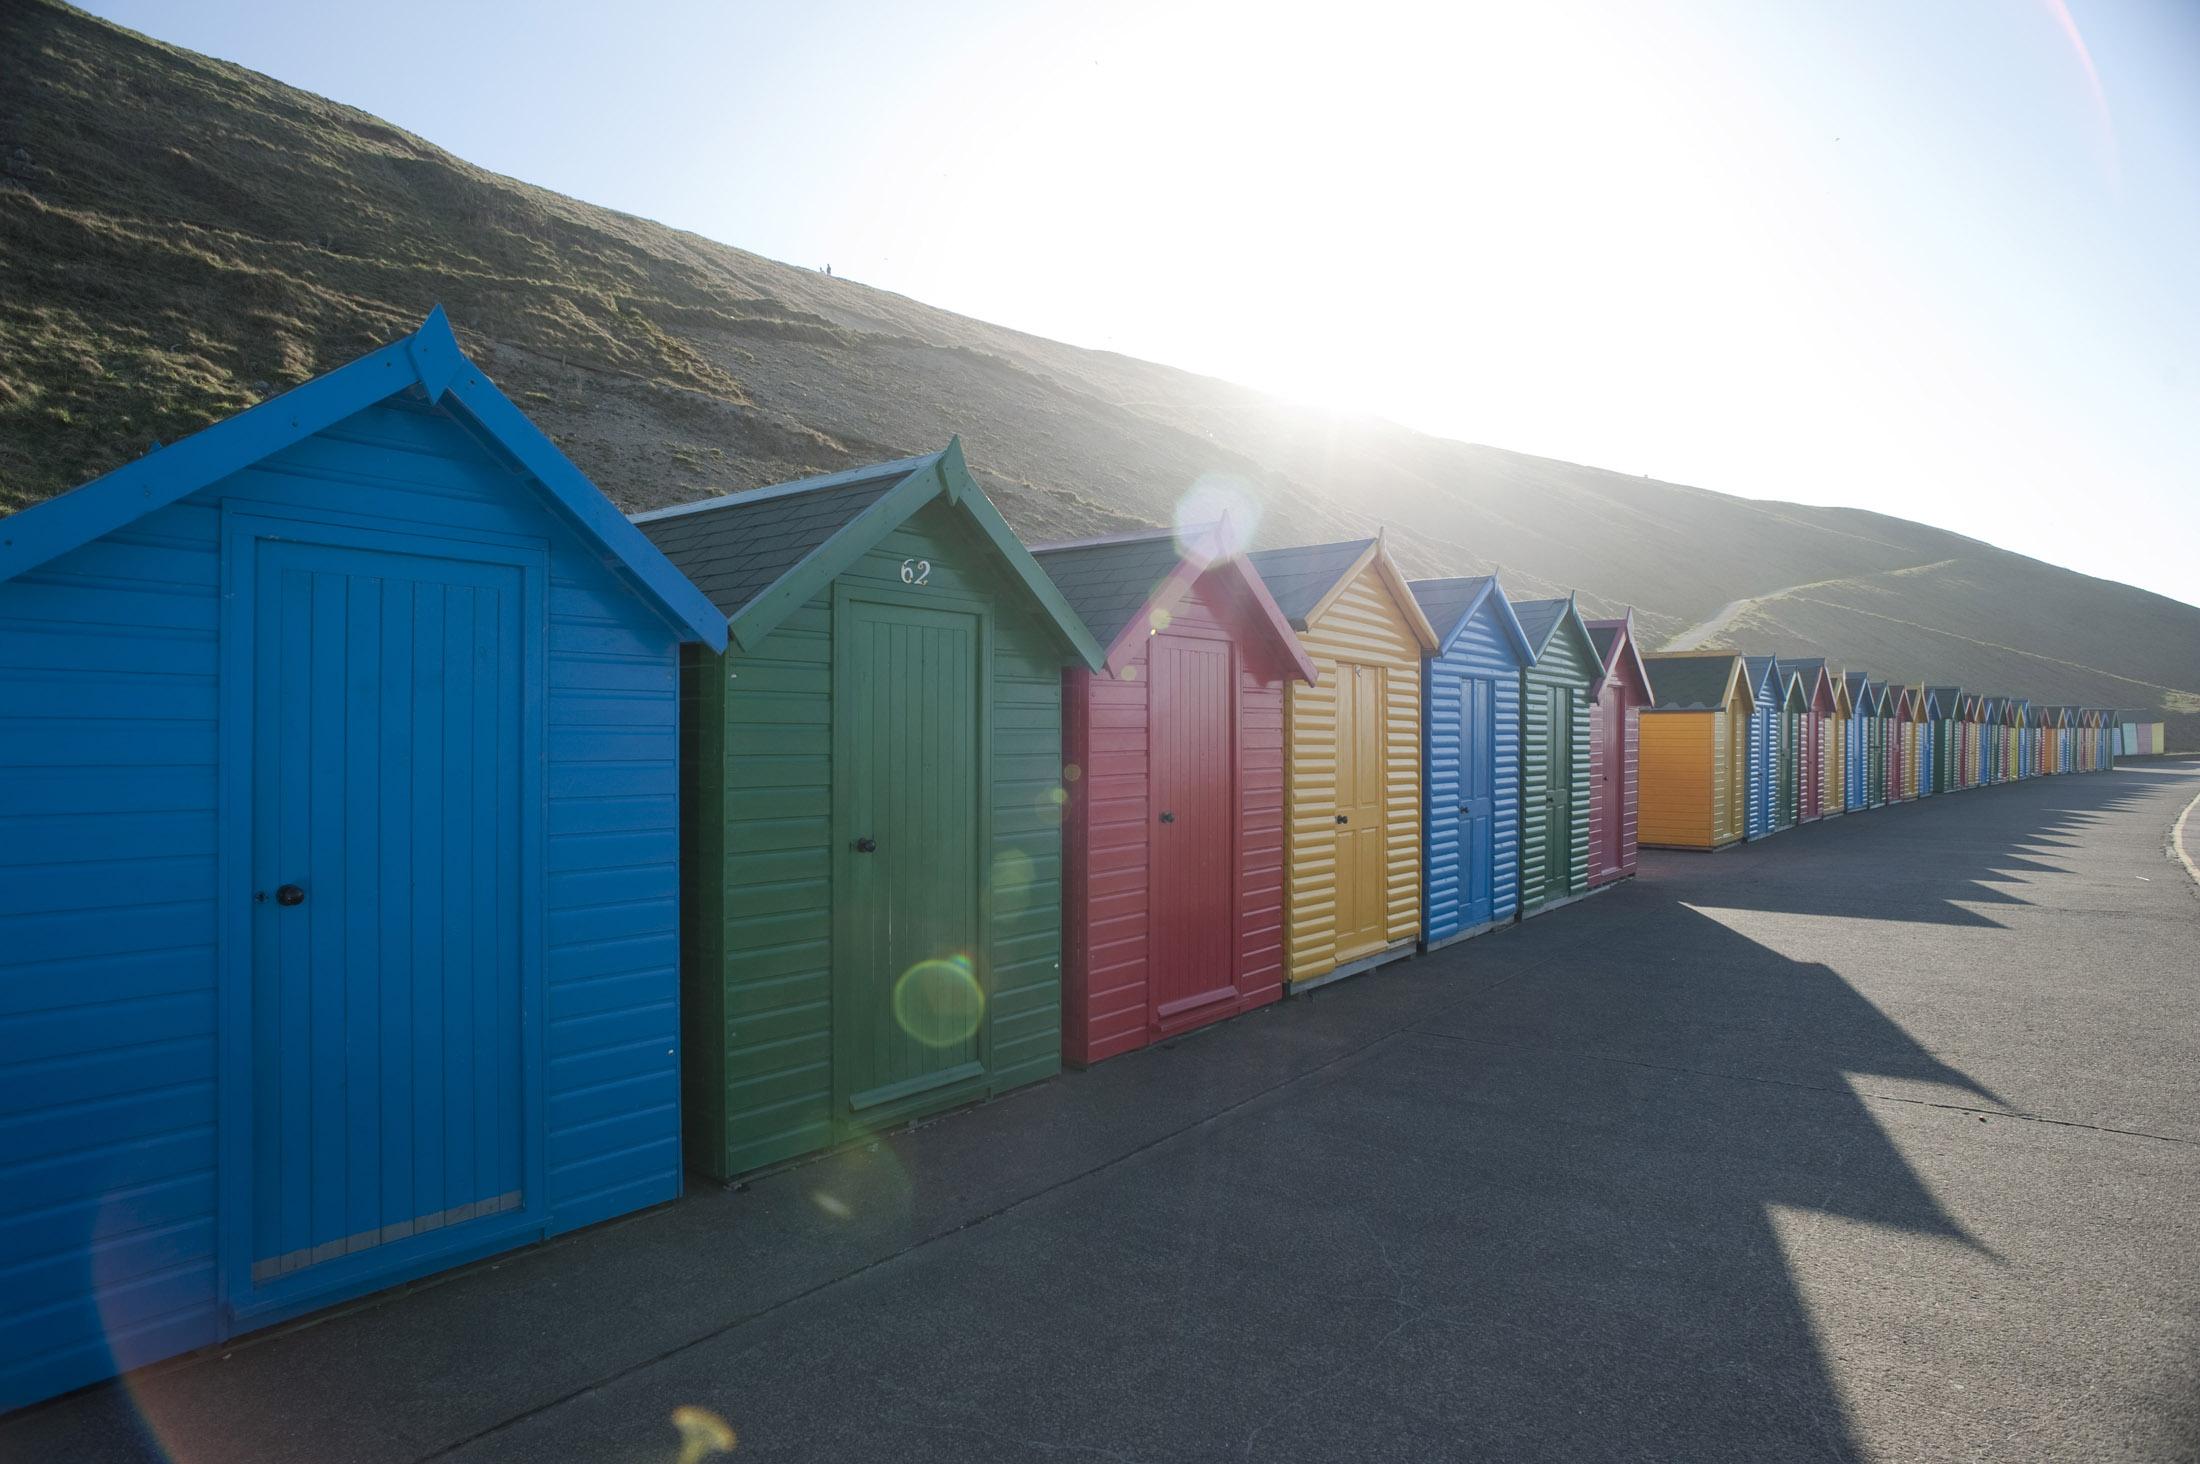 beach_huts_whitby.jpg